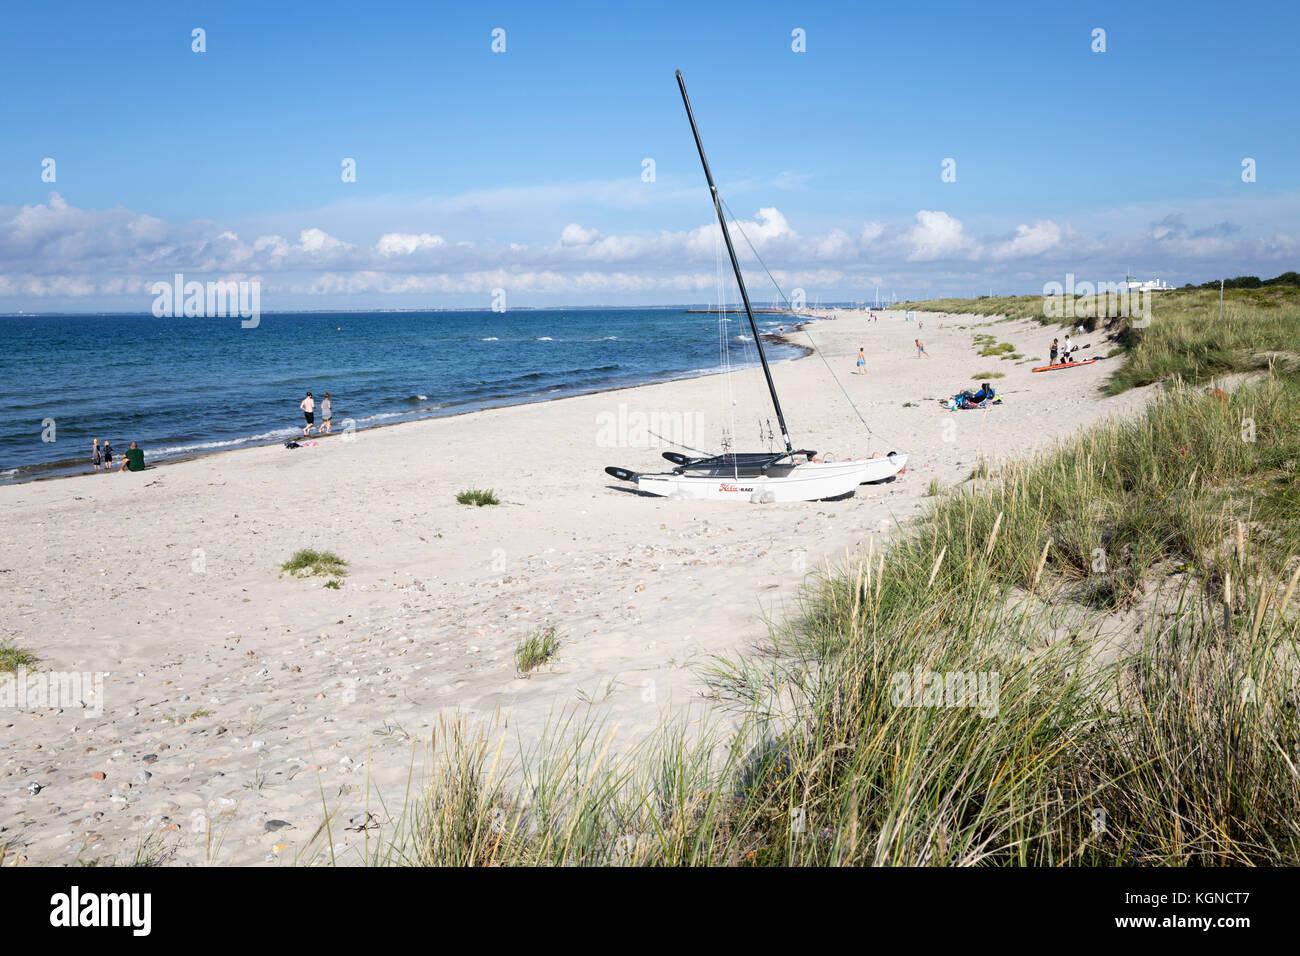 Hornbaek beach with white sand and sand dunes, Hornbaek, Kattegat Coast, Zealand, Denmark, Europe - Stock Image